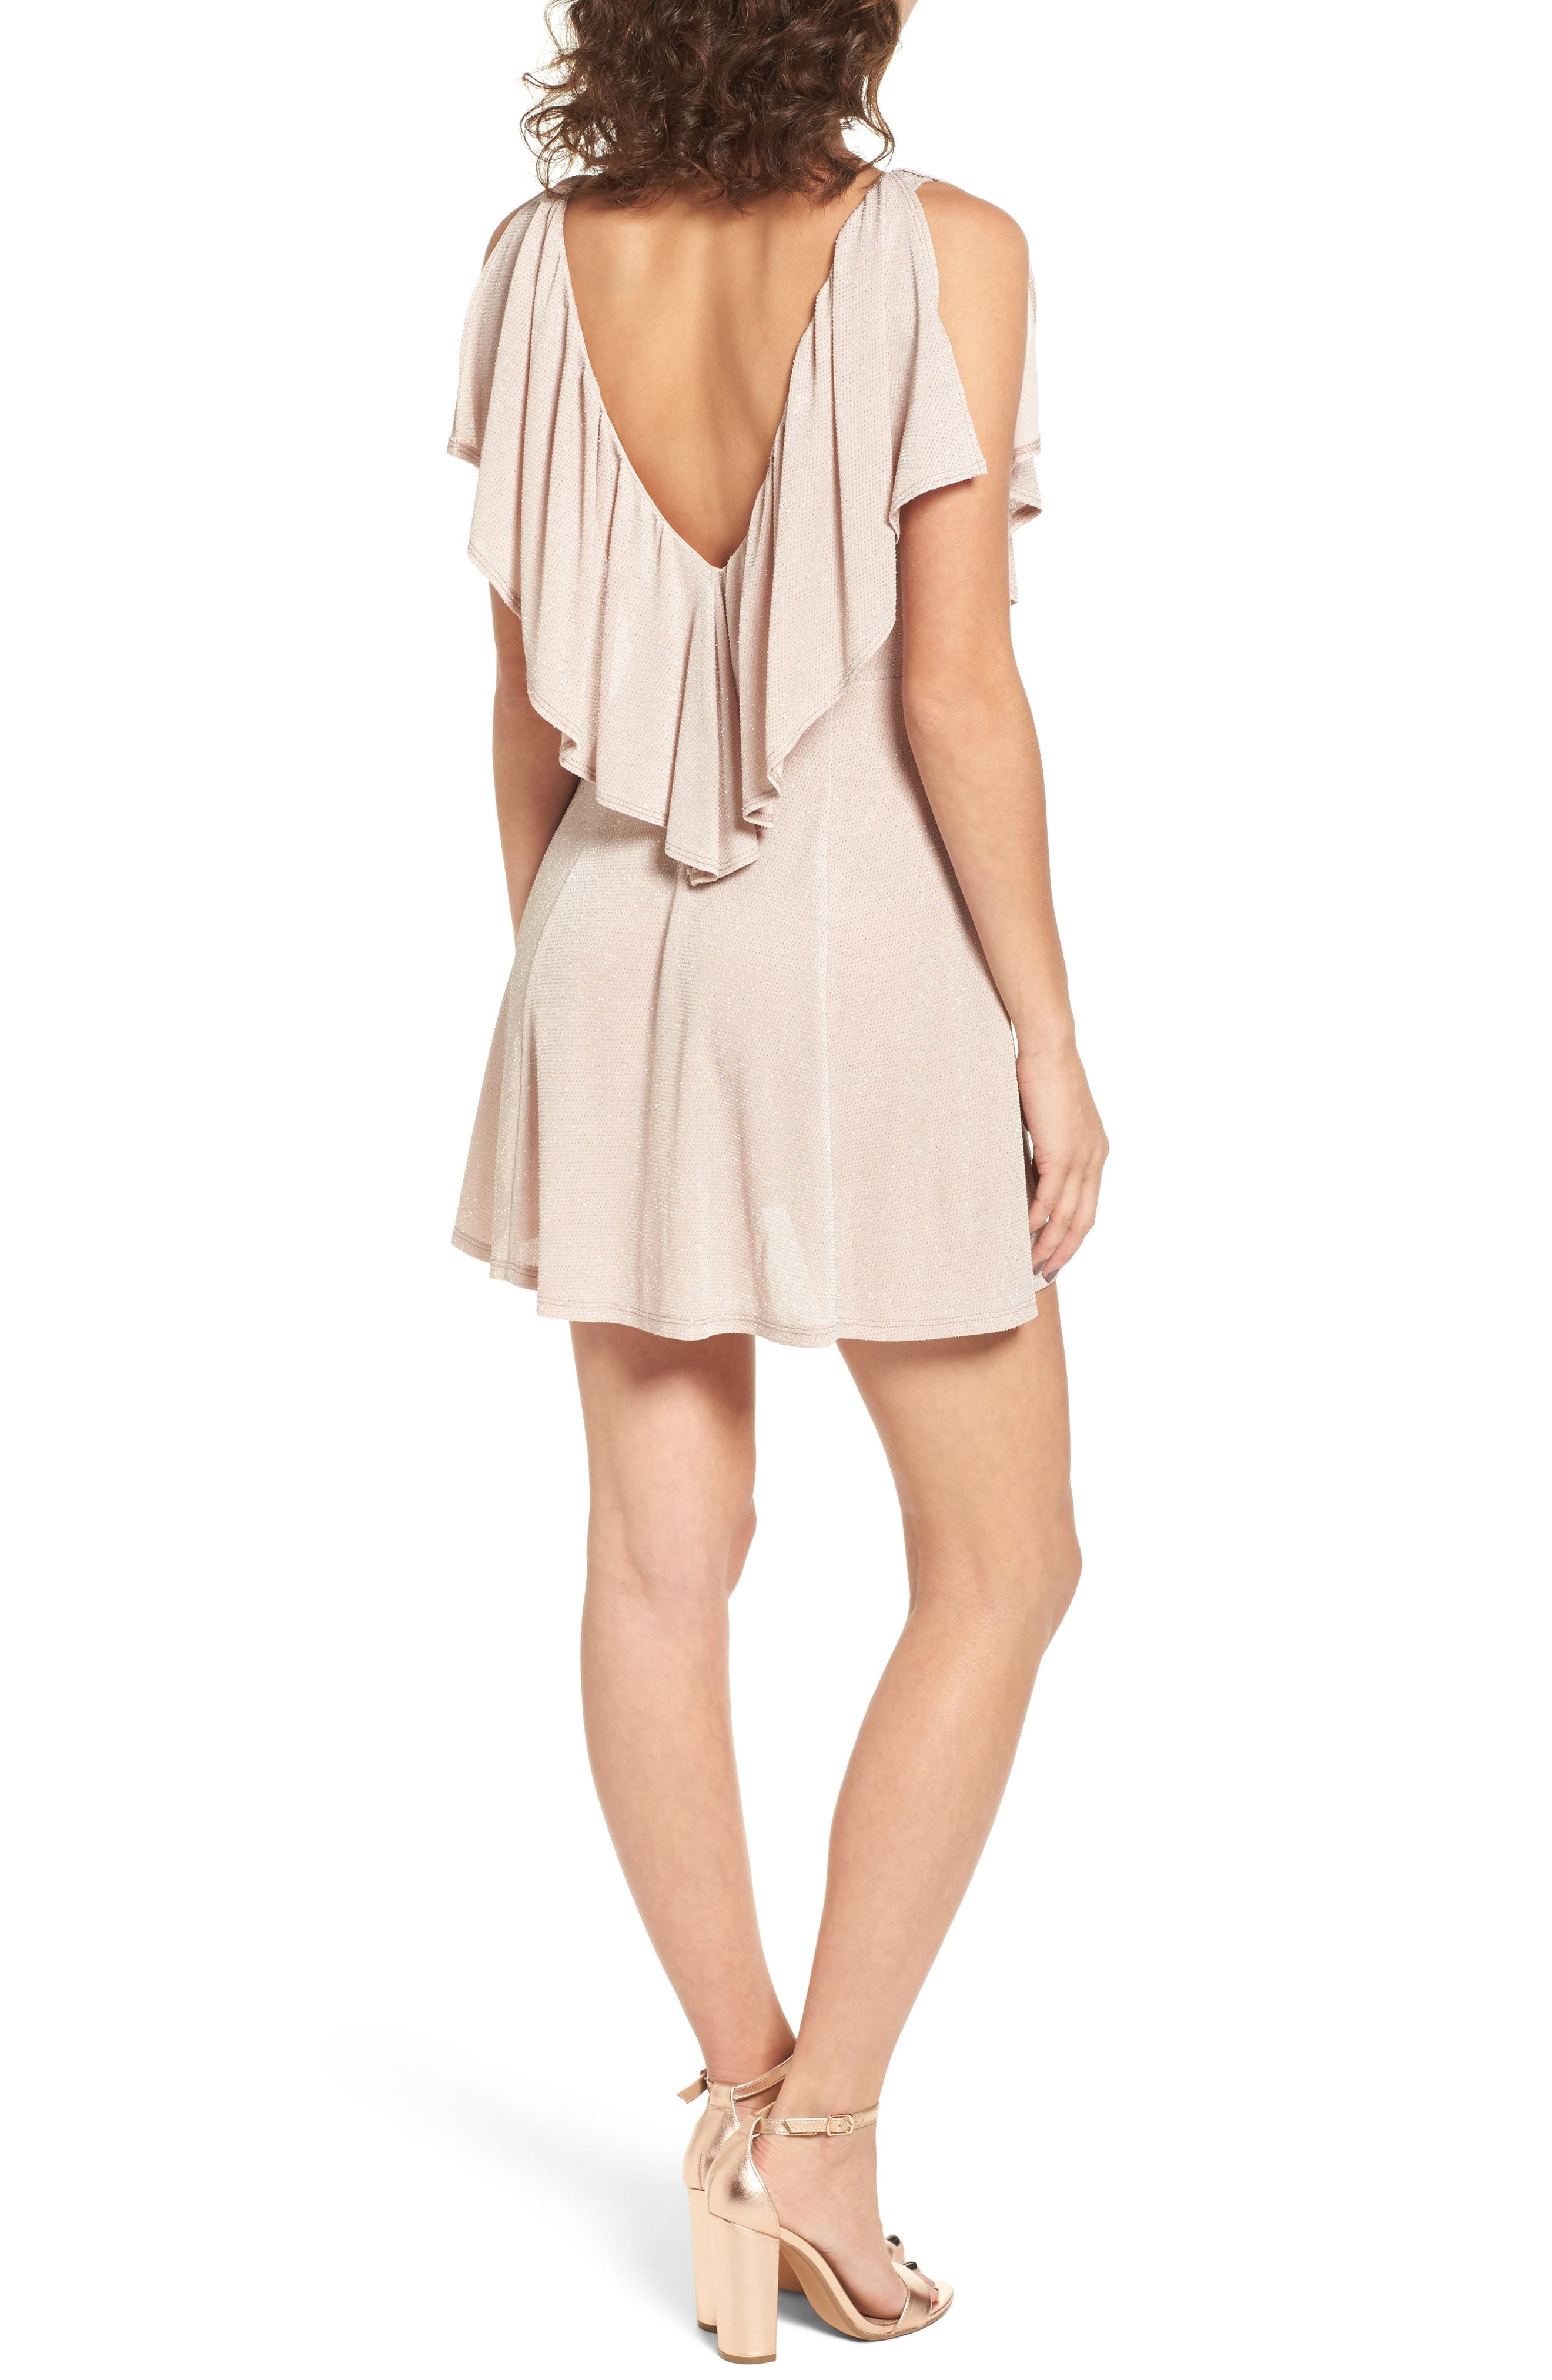 Daphne Ruffle Minidress,                             Alternate thumbnail 2, color,                             Dancing Queen Shine Blush